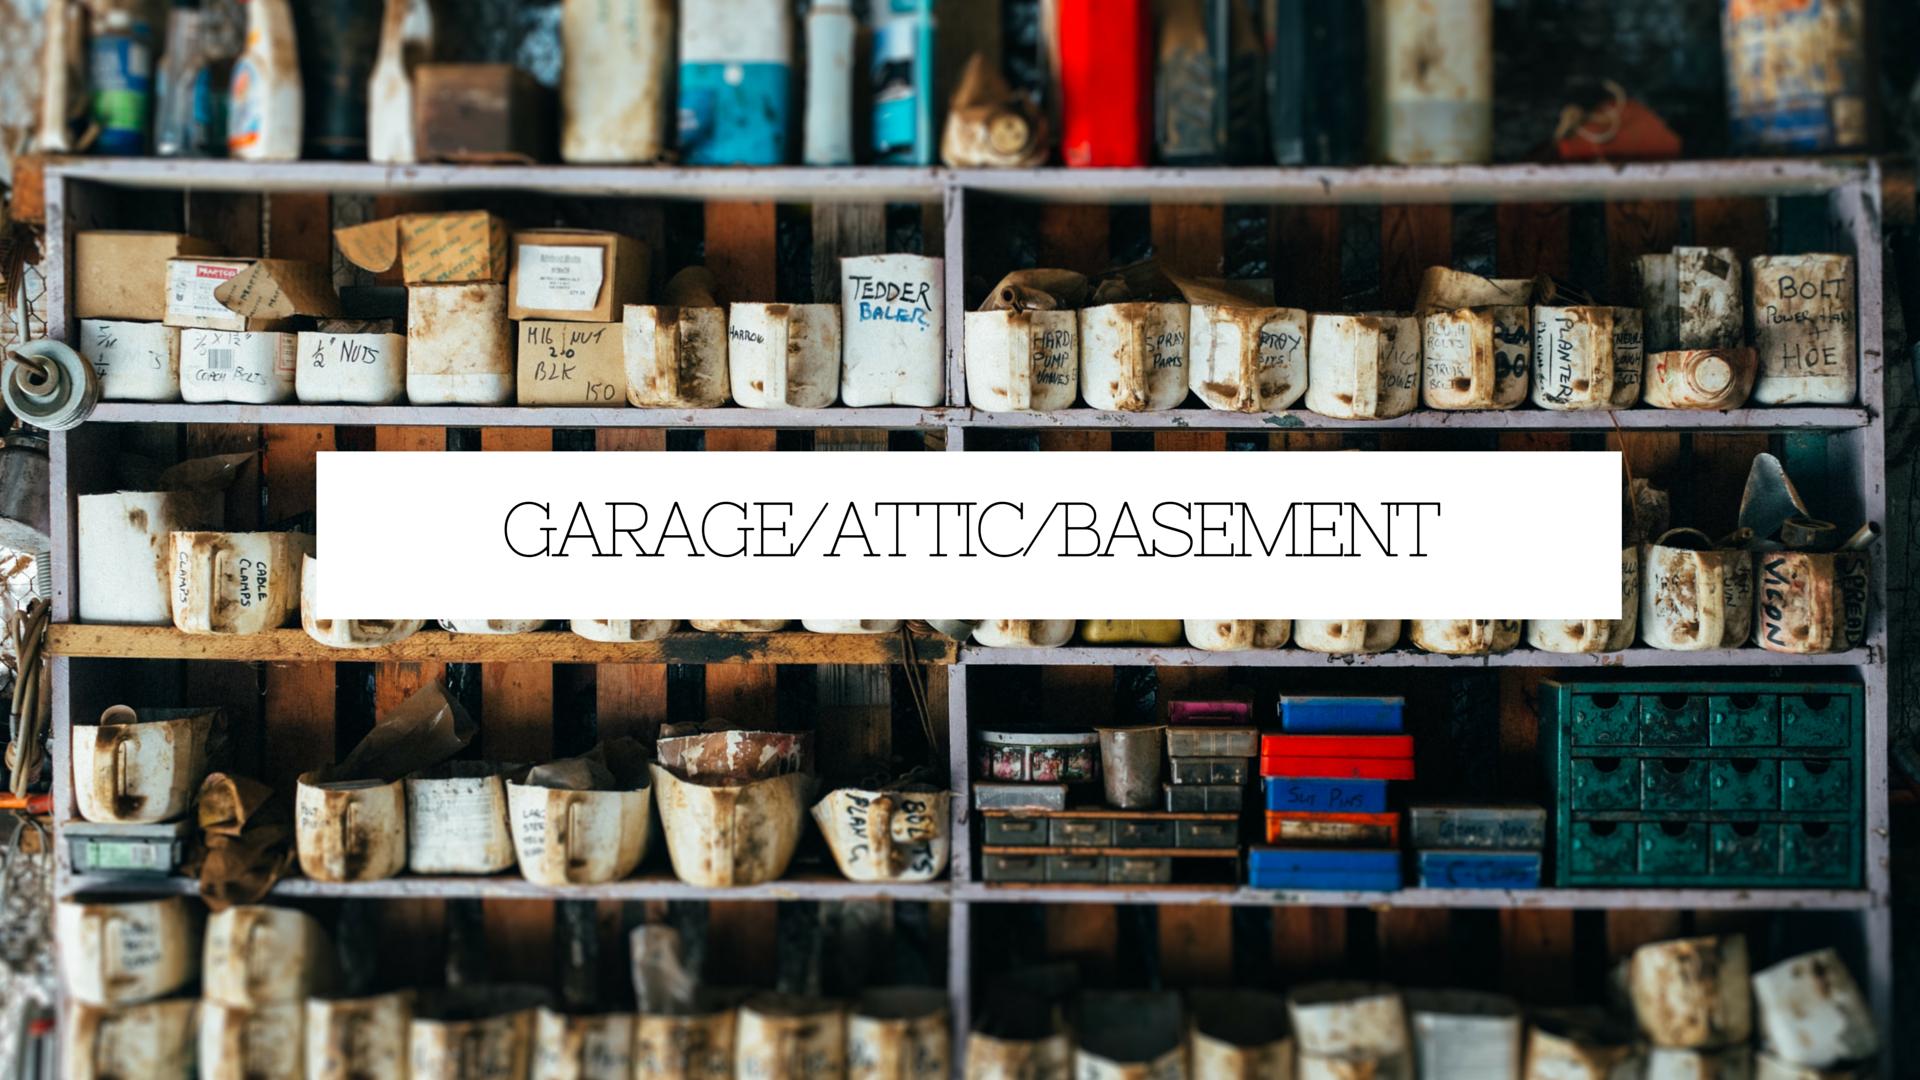 Garage/Attic/Basement